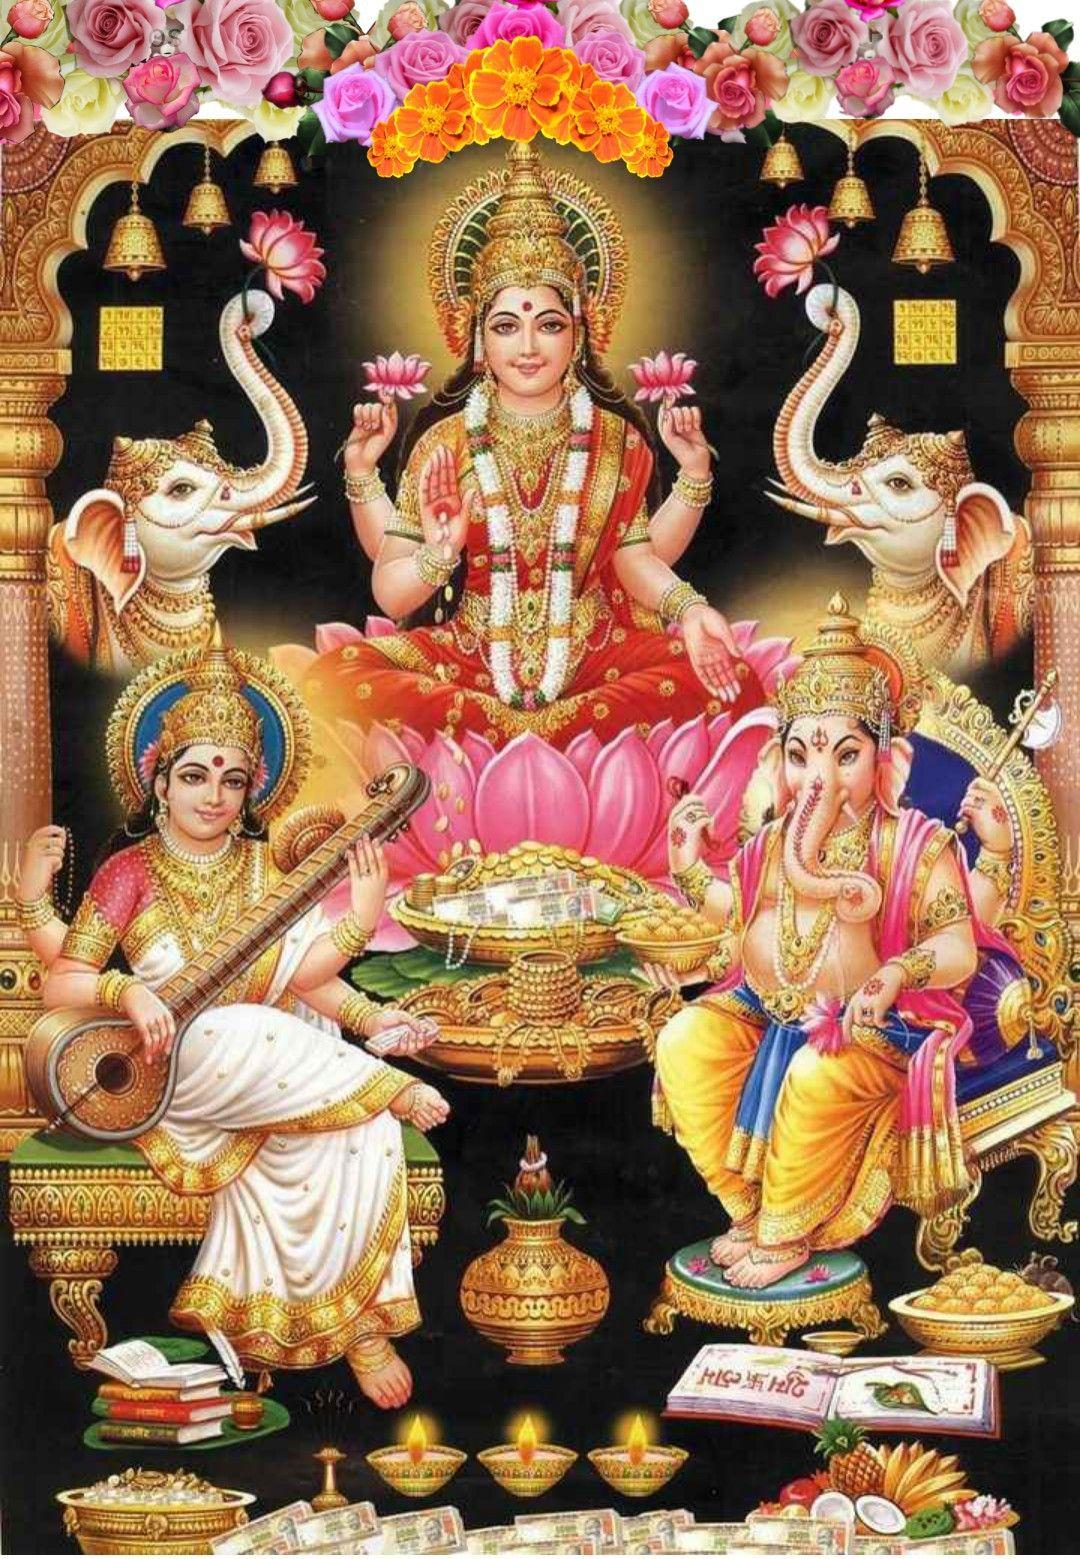 Pin By Simhadri Nageshwara On Lord Ganesh Saraswati Goddess Hindu Deities Ganesha Pictures